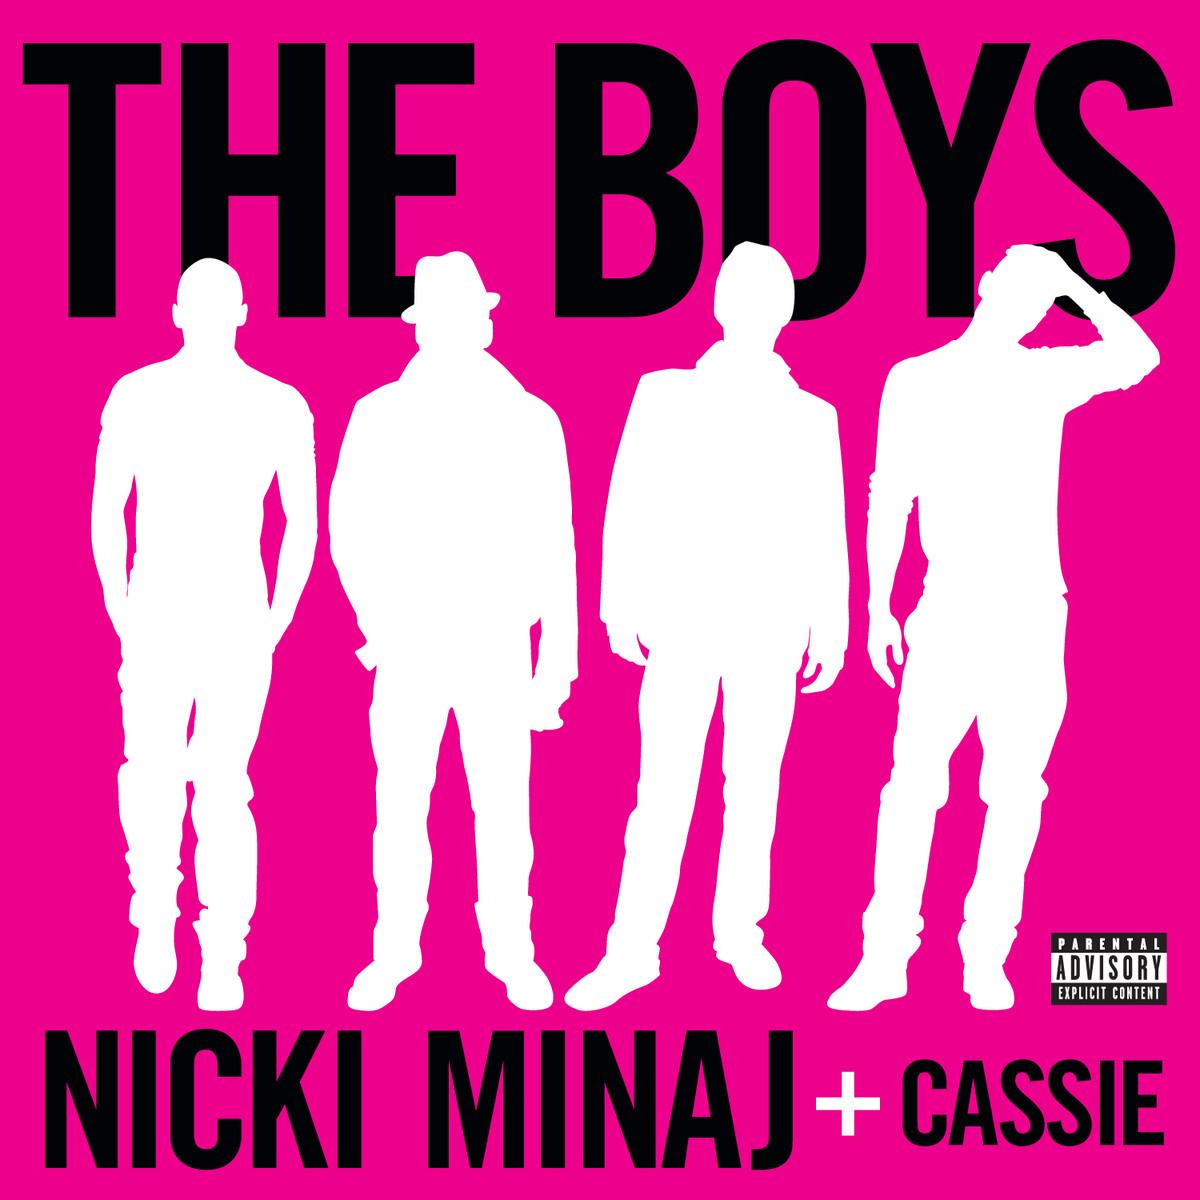 http://1.bp.blogspot.com/-FmtYeK46Jj4/UFJAhwwYctI/AAAAAAAAEVs/PQamfvTwR9s/s1600/Nicki-Minaj-The-Boys-Official-2012.png